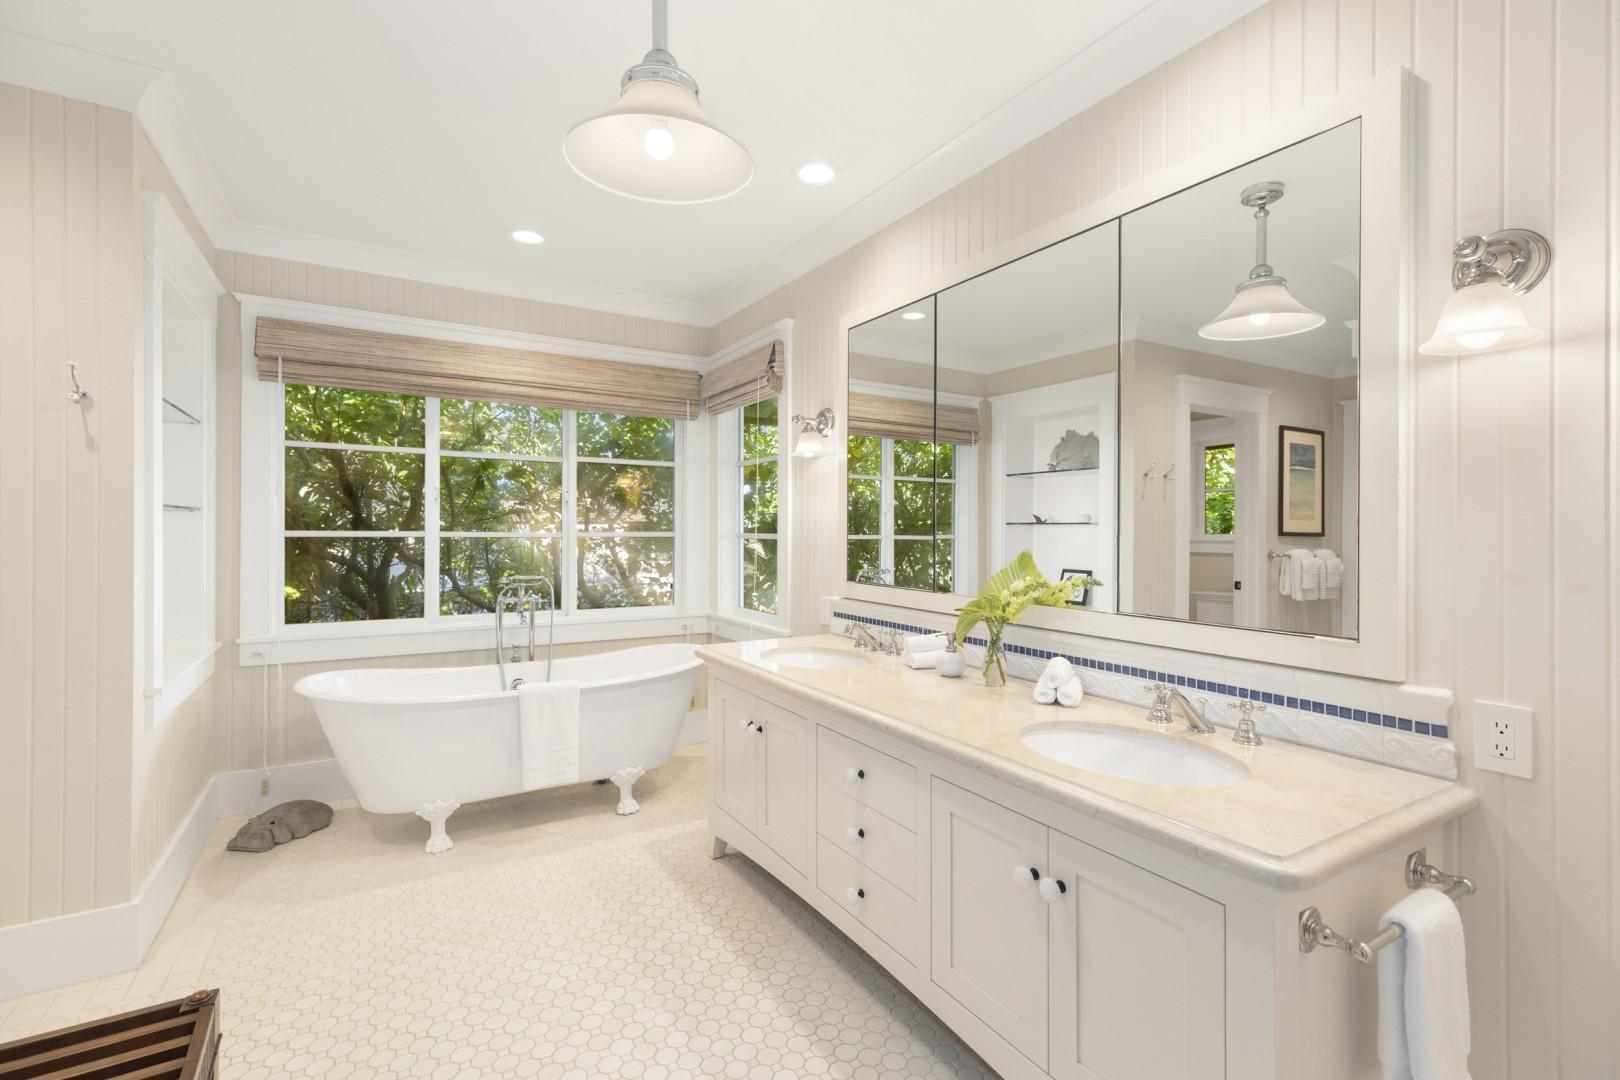 Kapa Suite en suite bathroom with claw-foot tub